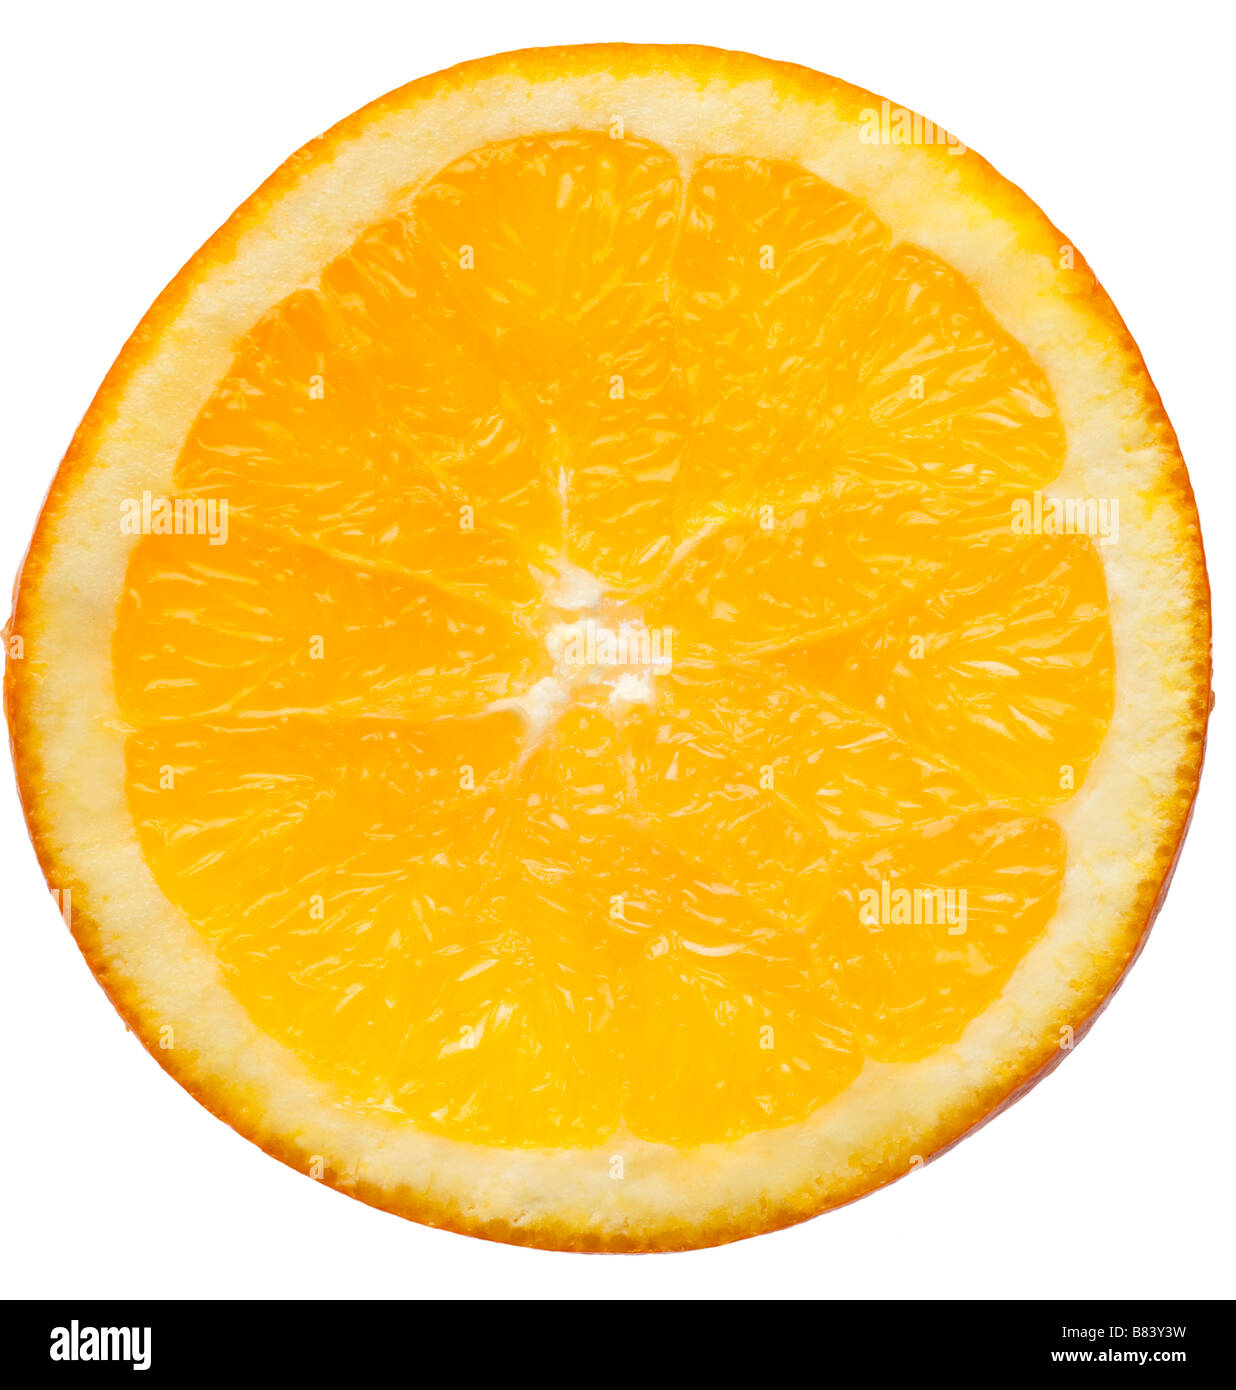 Slice of orange on white closeup - Stock Image